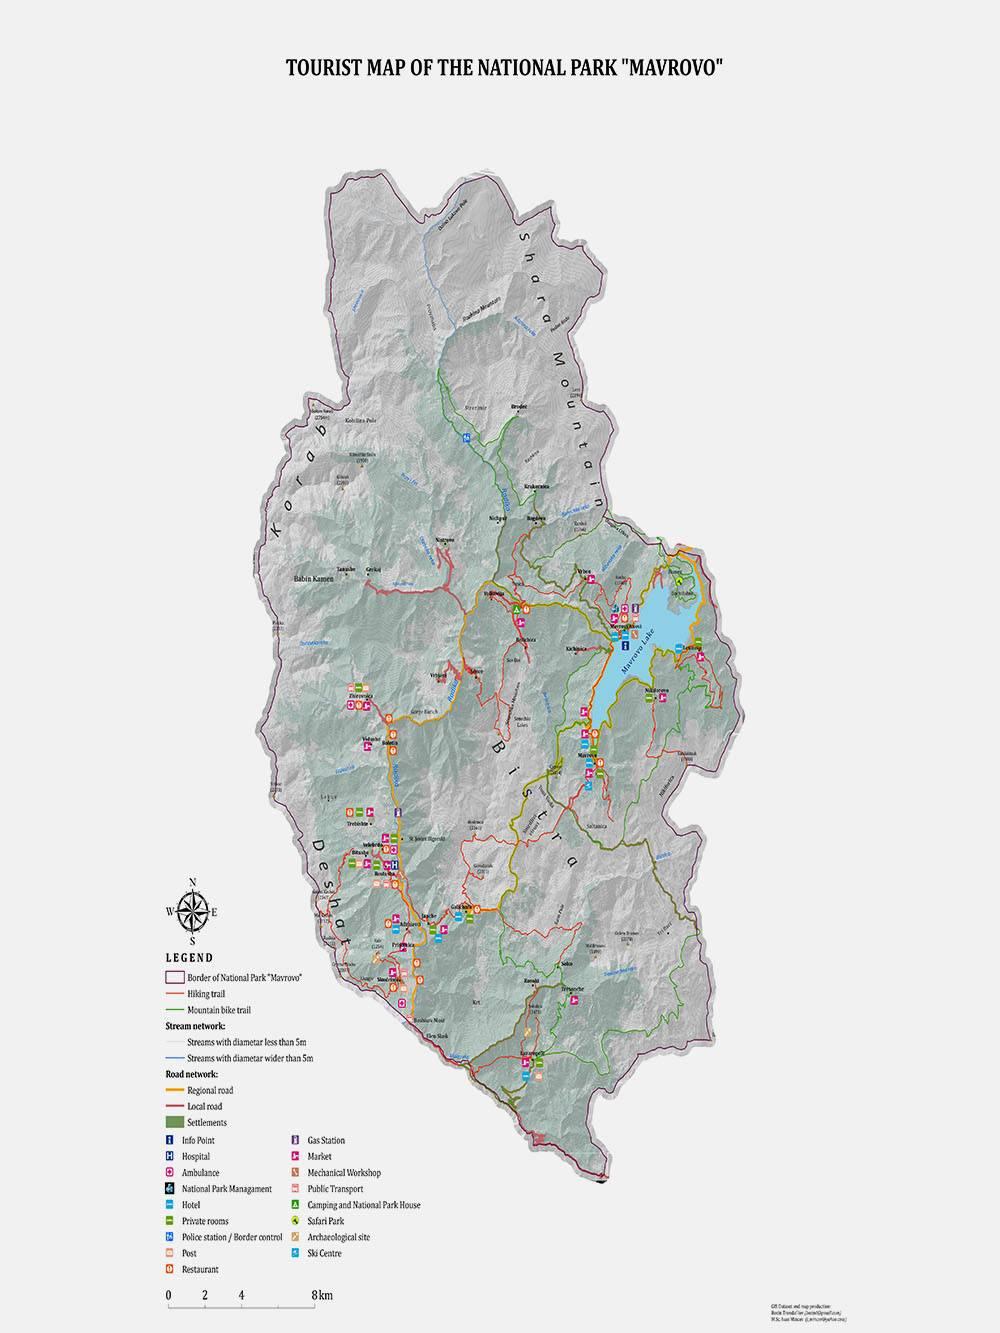 Карта национального парка «Маврово». Источник: np.mavrovo.mk